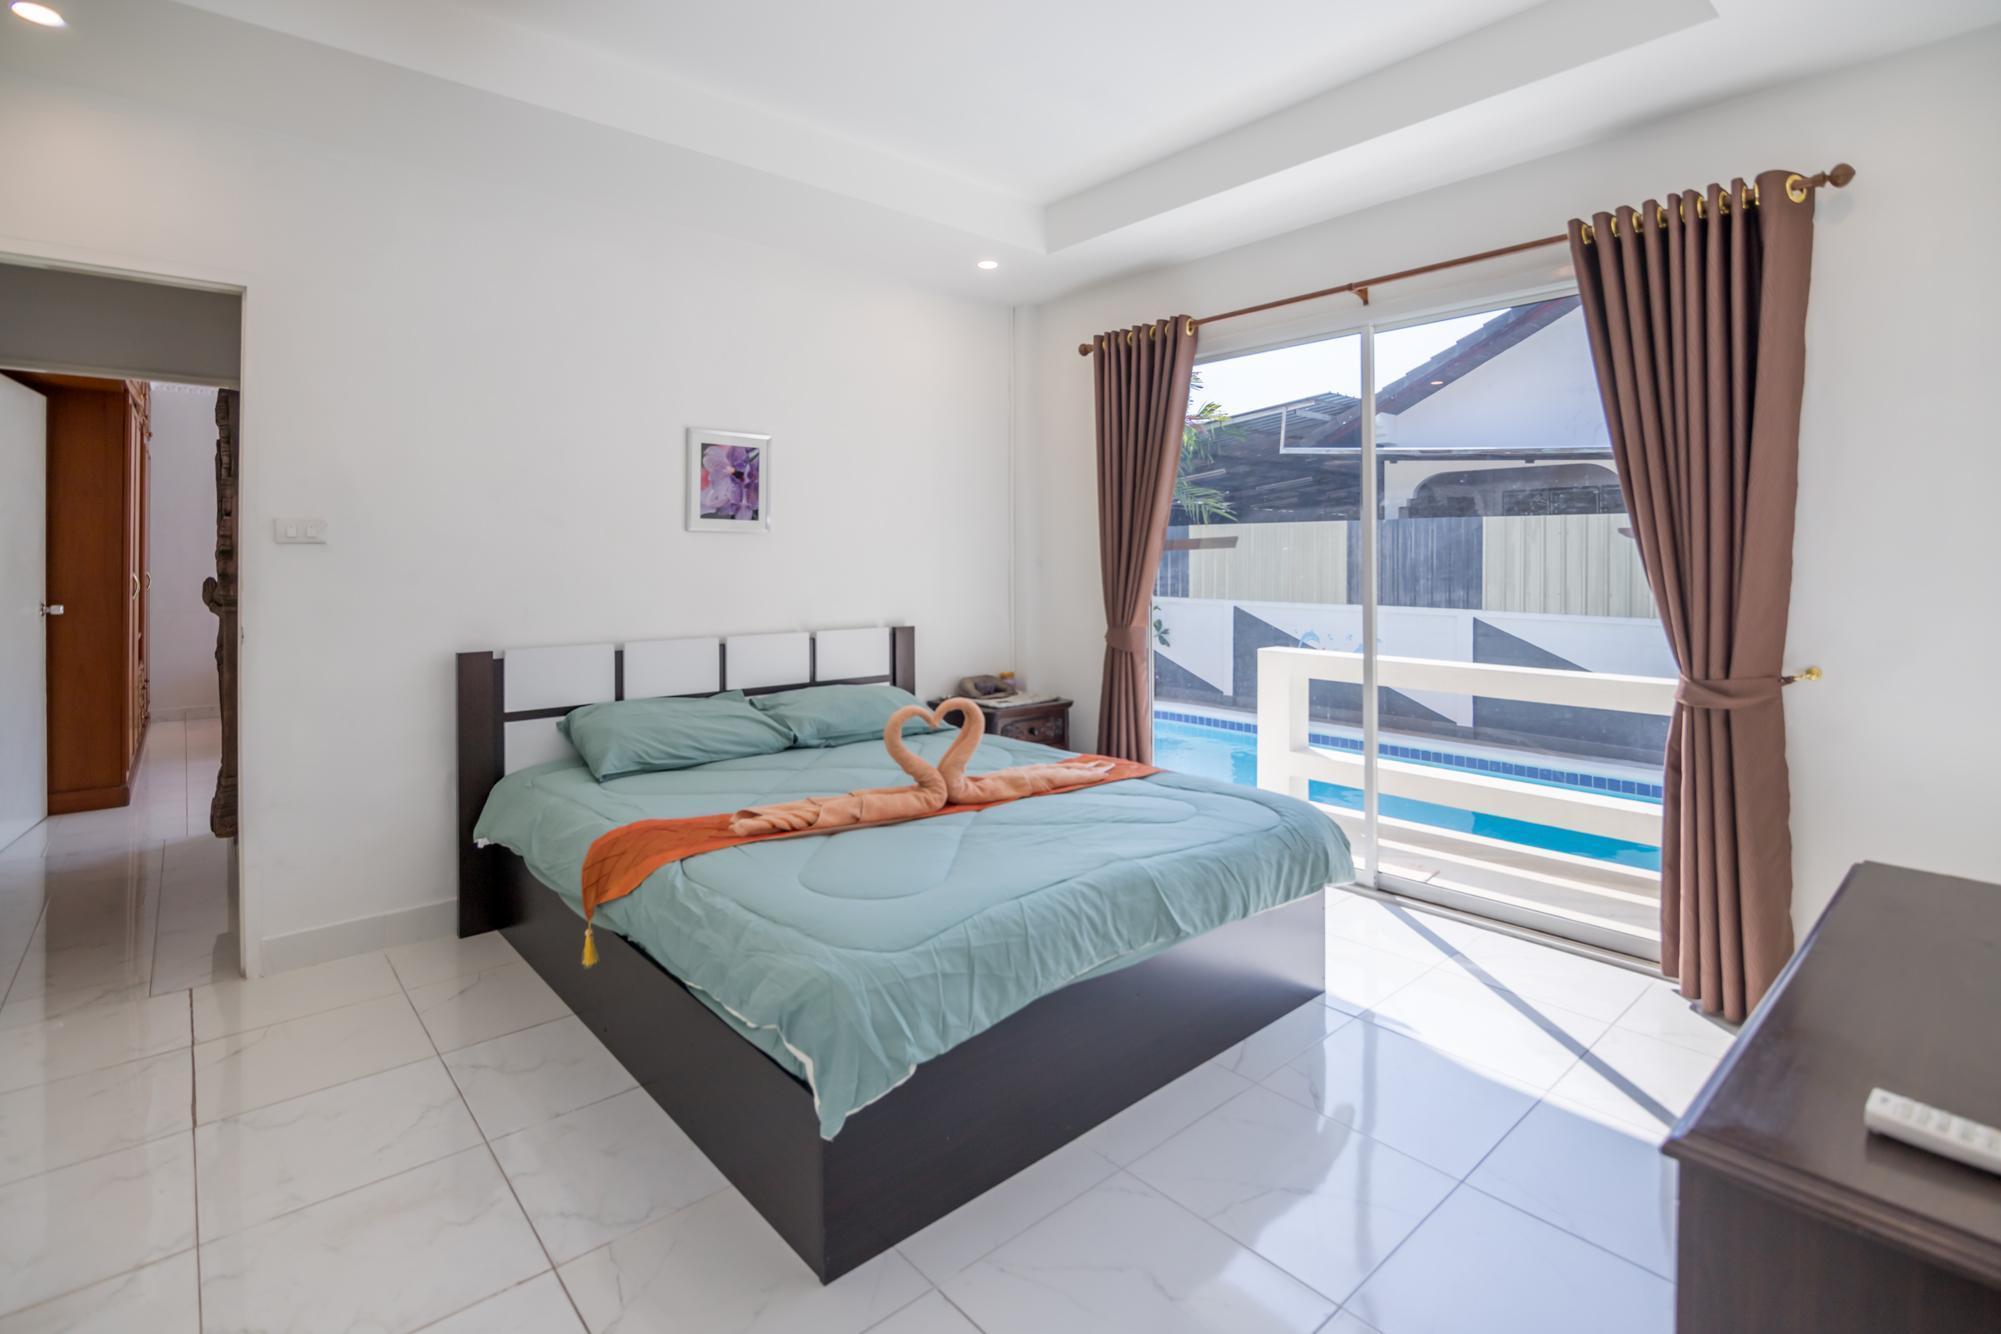 Affordable luxury resort in Central Pattaya วิลลา 4 ห้องนอน 4 ห้องน้ำส่วนตัว ขนาด 500 ตร.ม. – พัทยาใต้